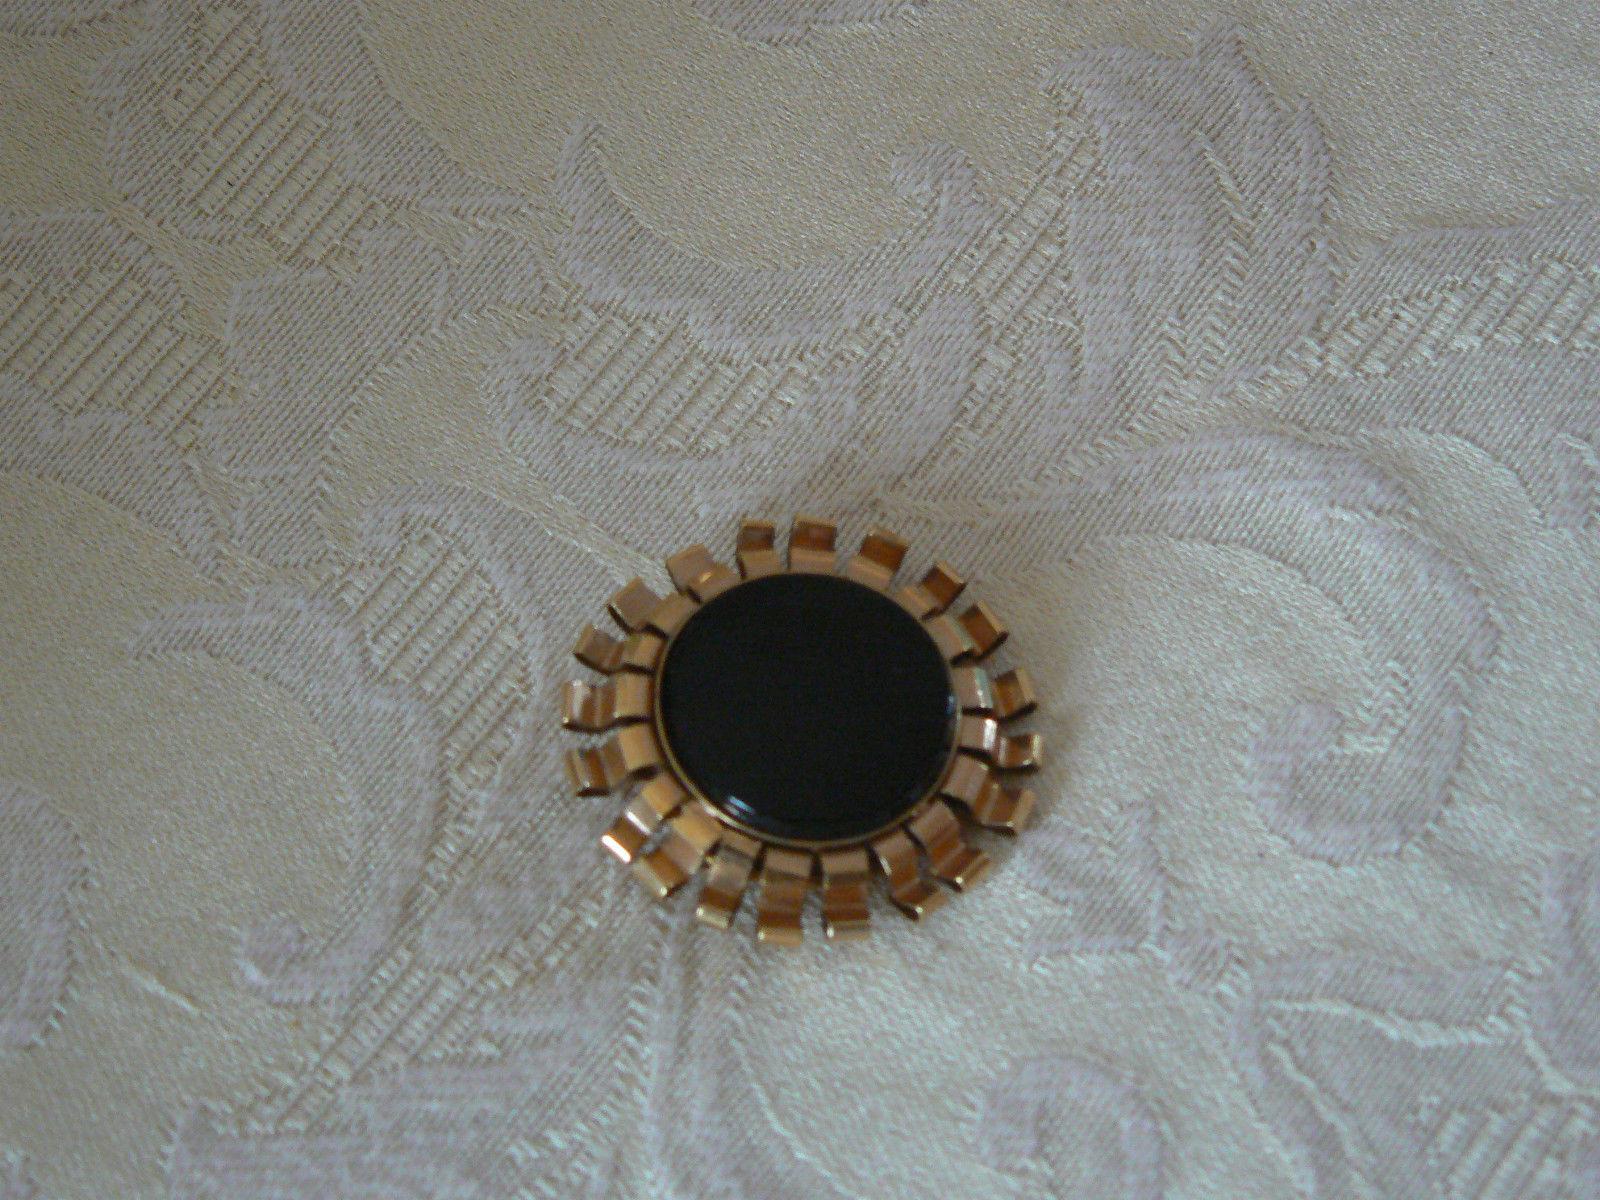 Lovely Vintage Gold Winard 12K GF Black Onyx Center Brooch